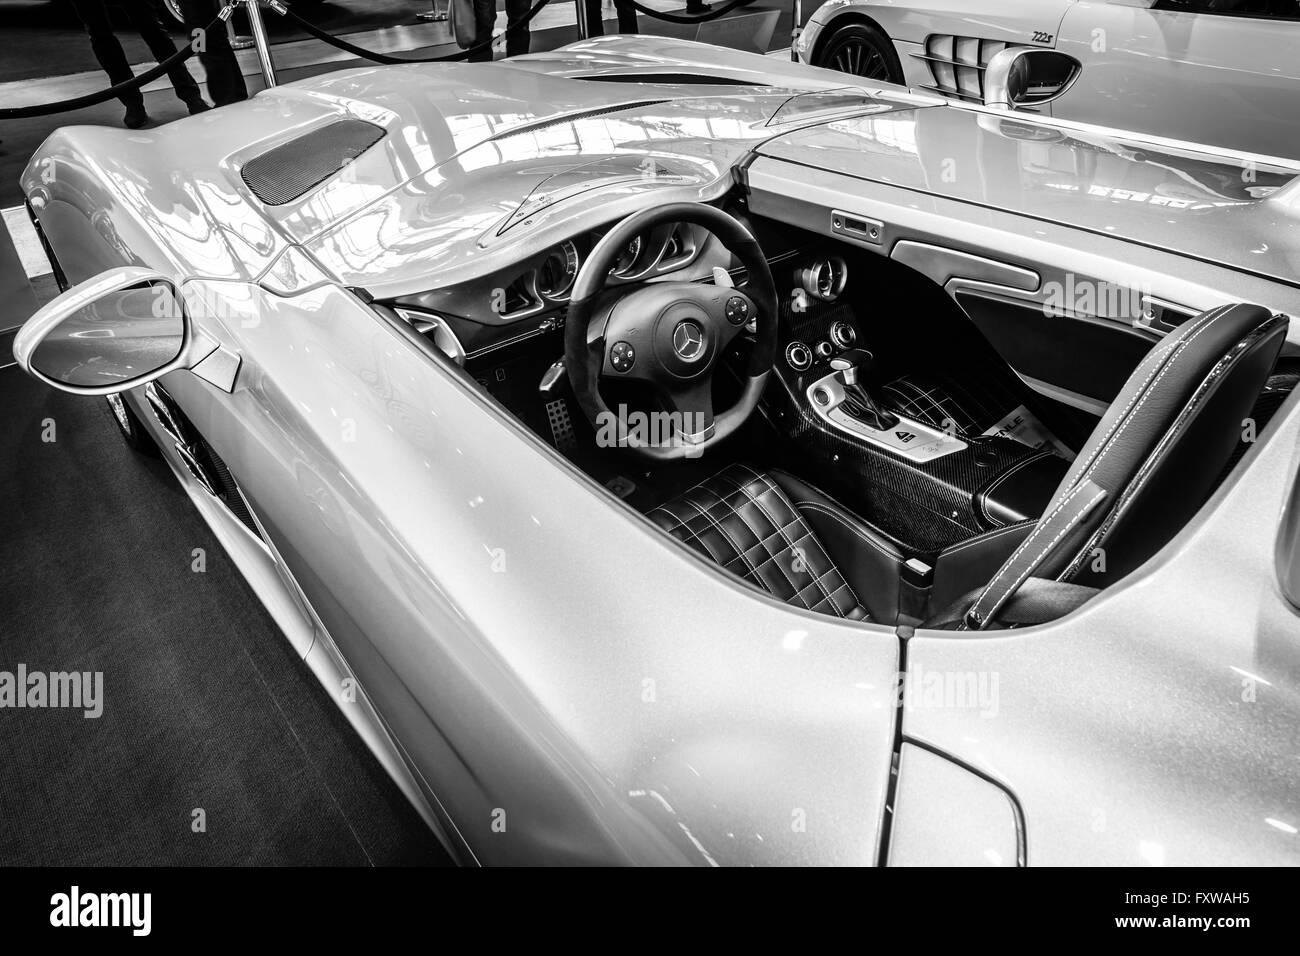 Cabin of grand tourer car Mercedes-Benz SLR Stirling Moss (limited edition, 75 vehicles), 2009 - Stock Image